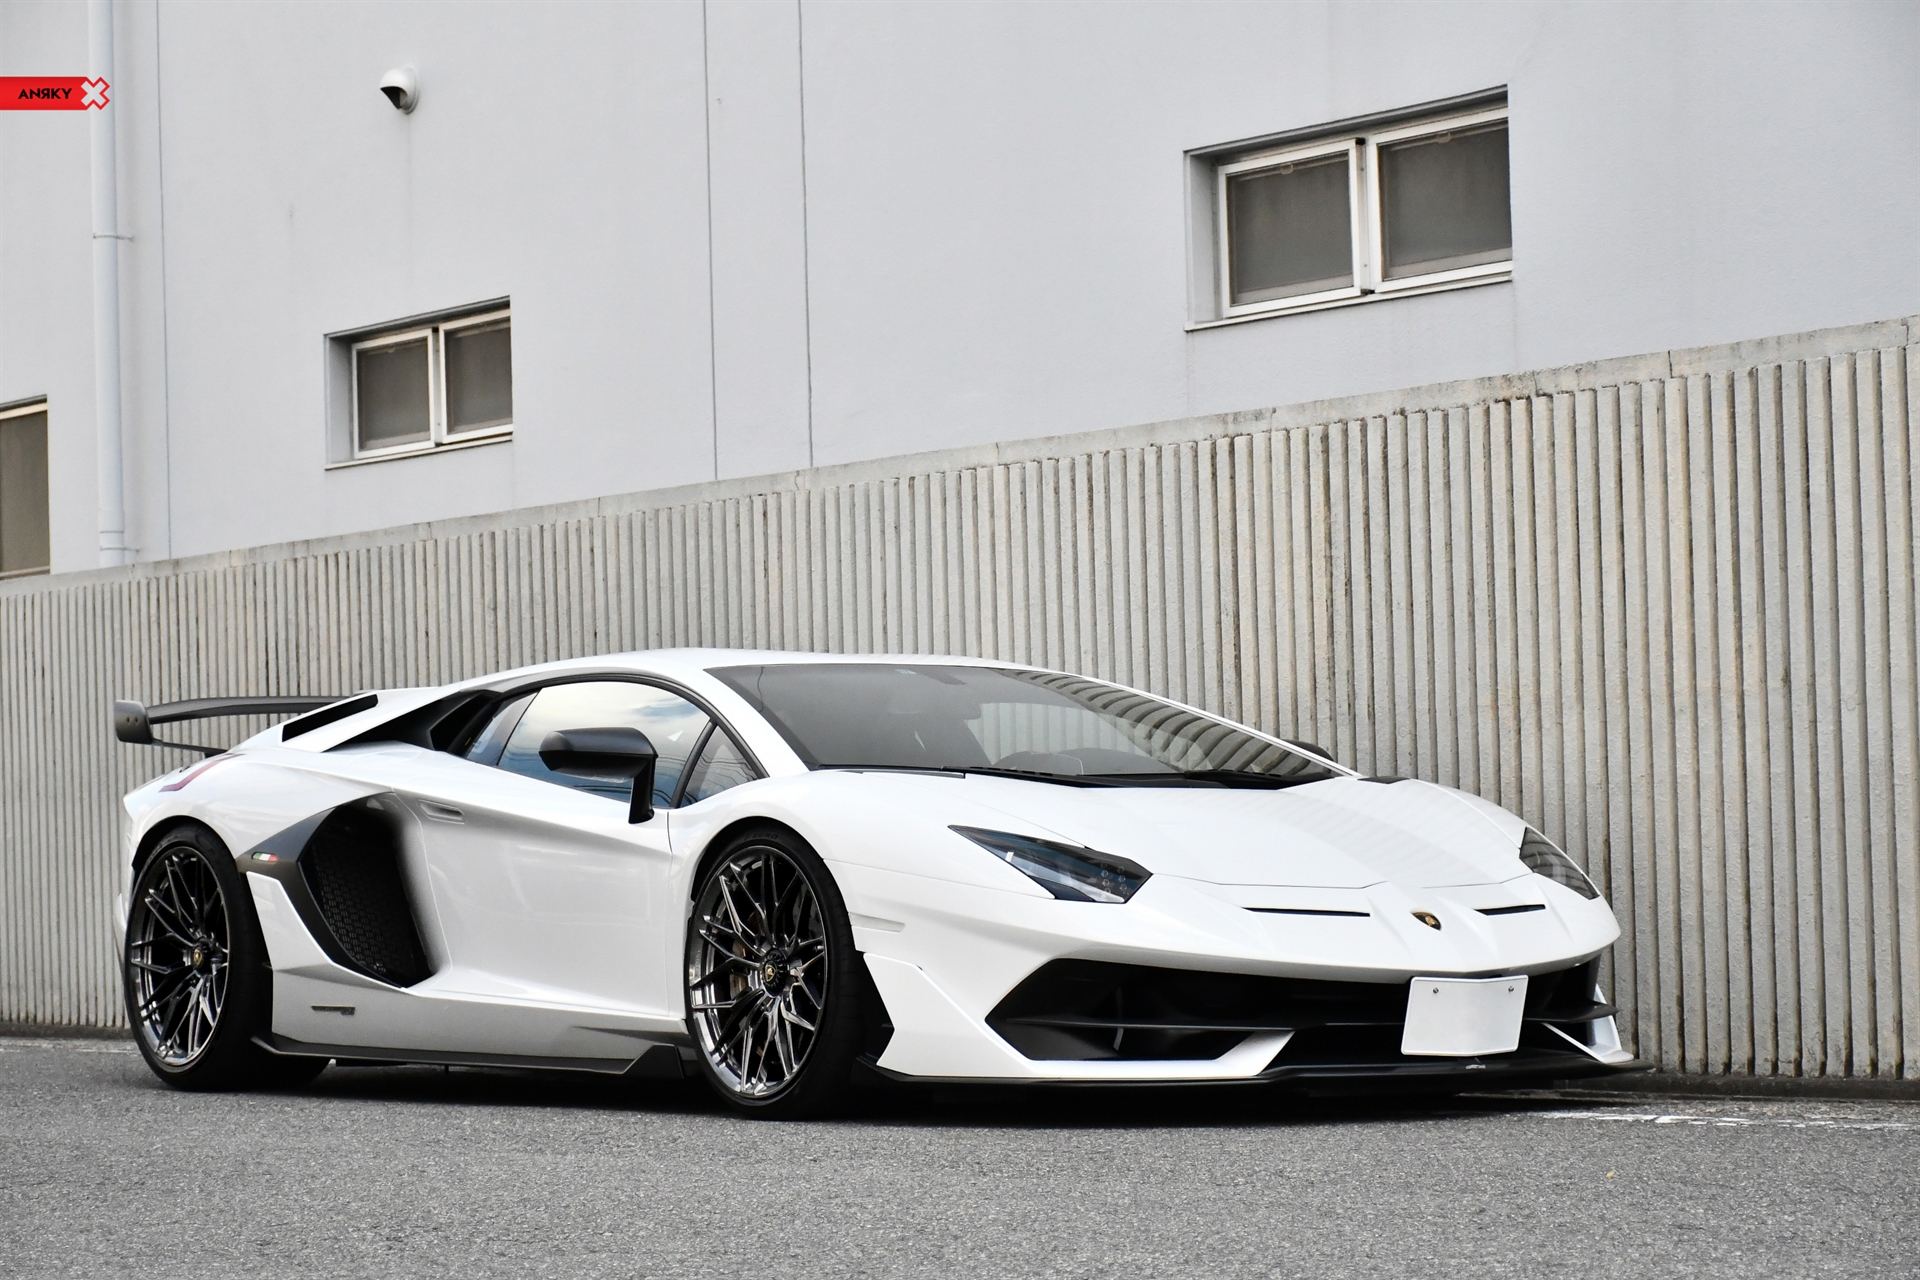 Lamborghini Aventador SVJ – X|Series S1-X1